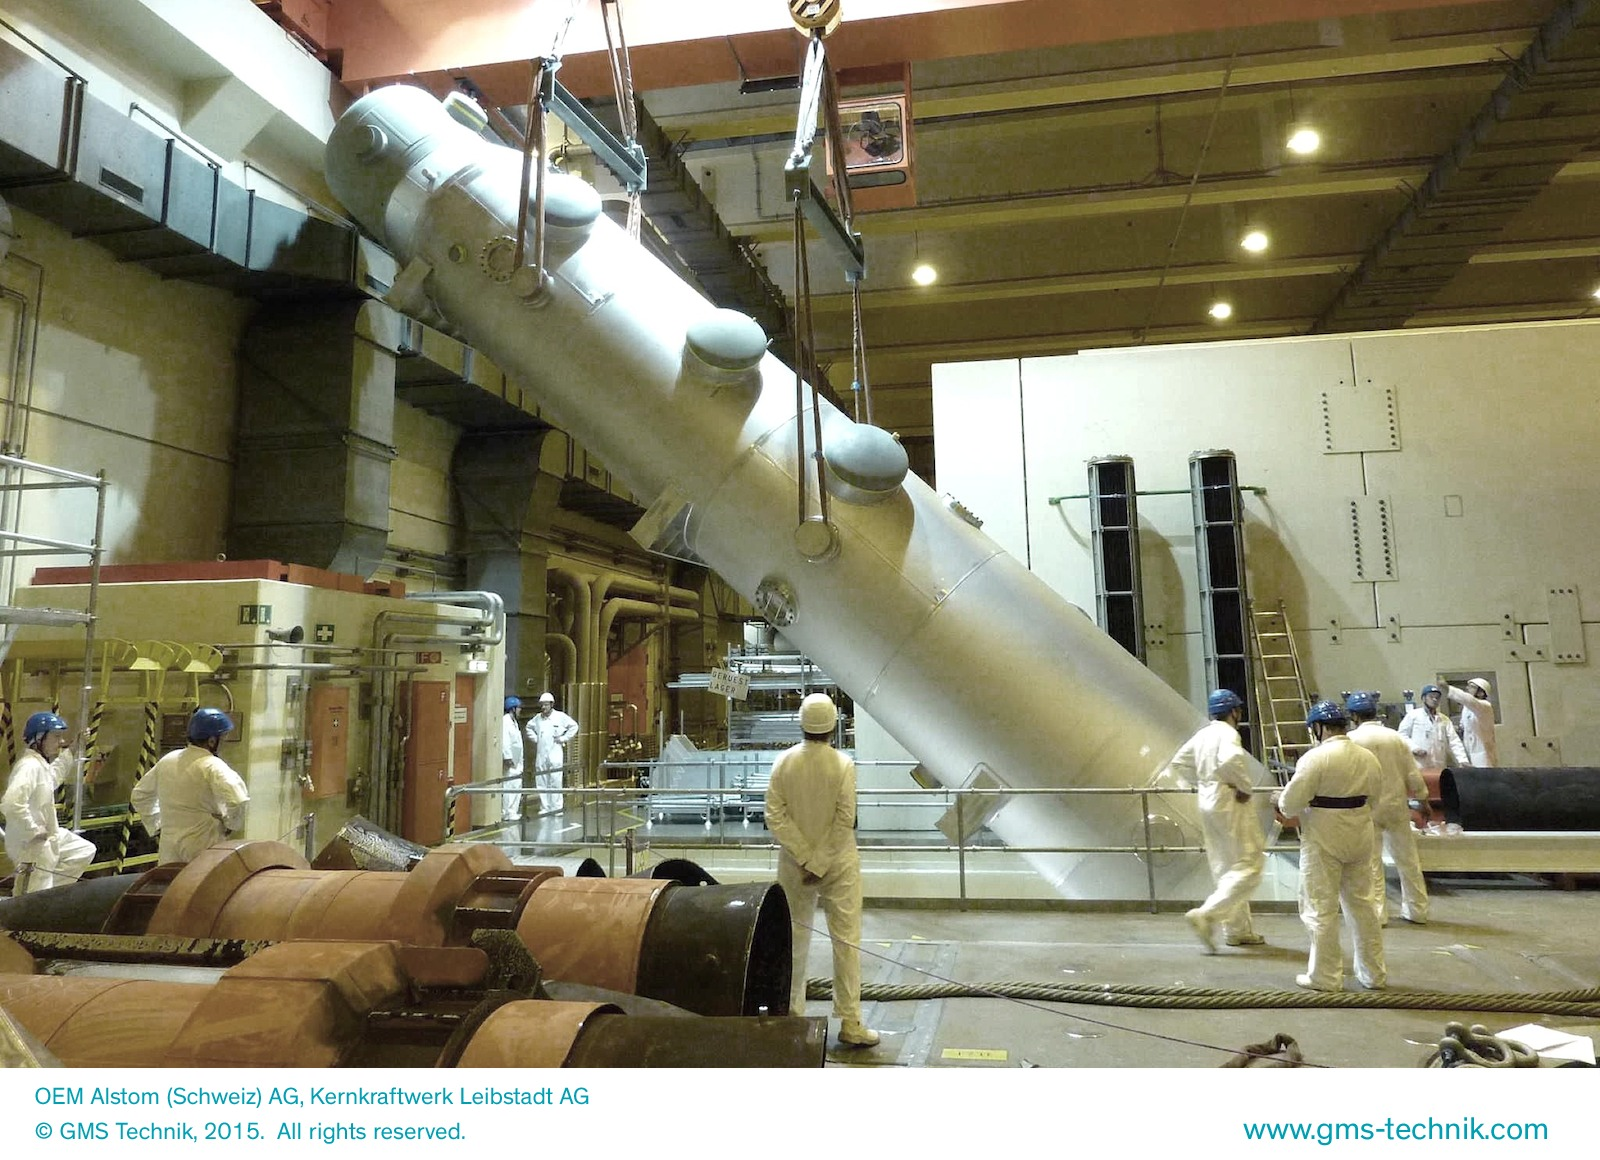 OEM Alstom (Schweiz) AG, Kernkraftwerk Leibstadt AG